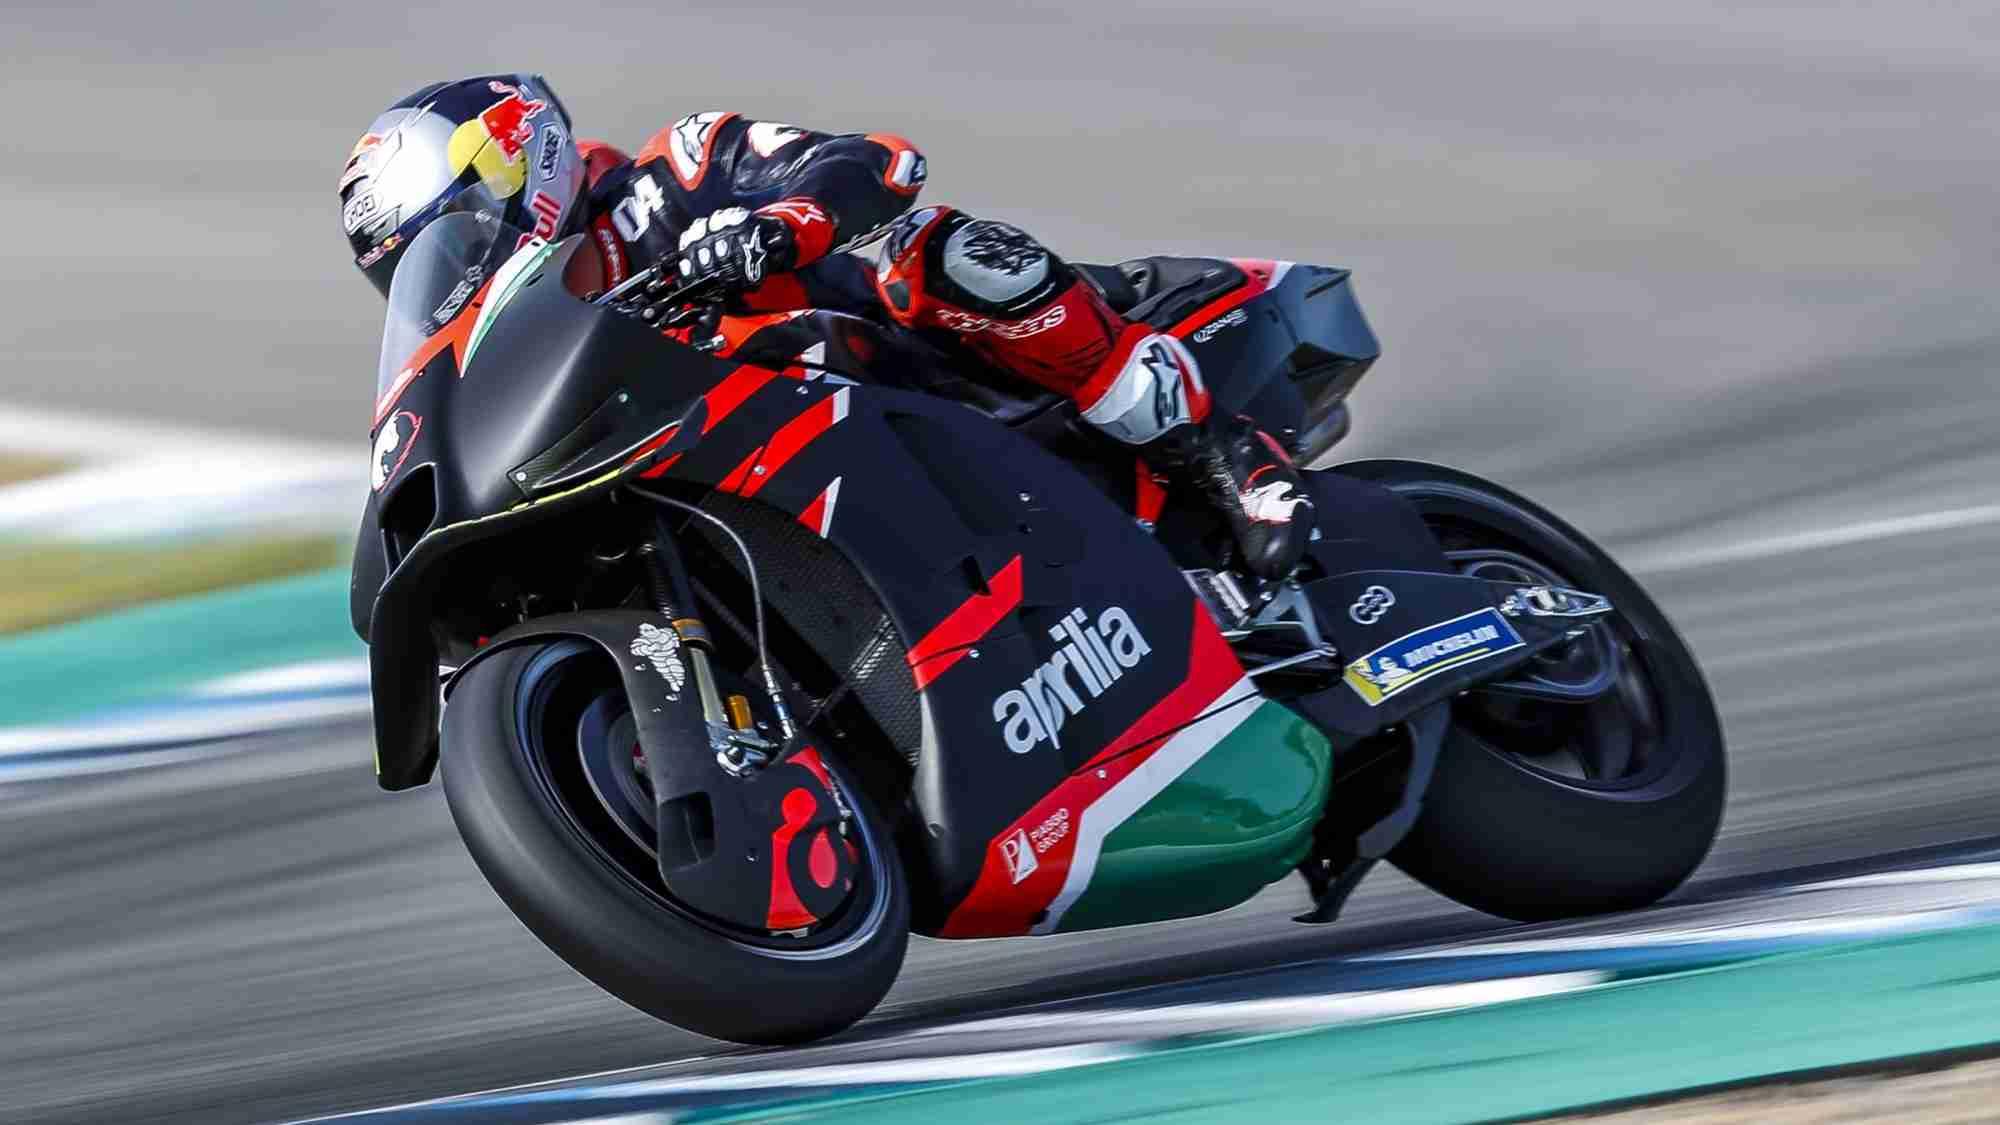 Andrea Dovizioso to test Aprilia RS-GP MotoGP bike again